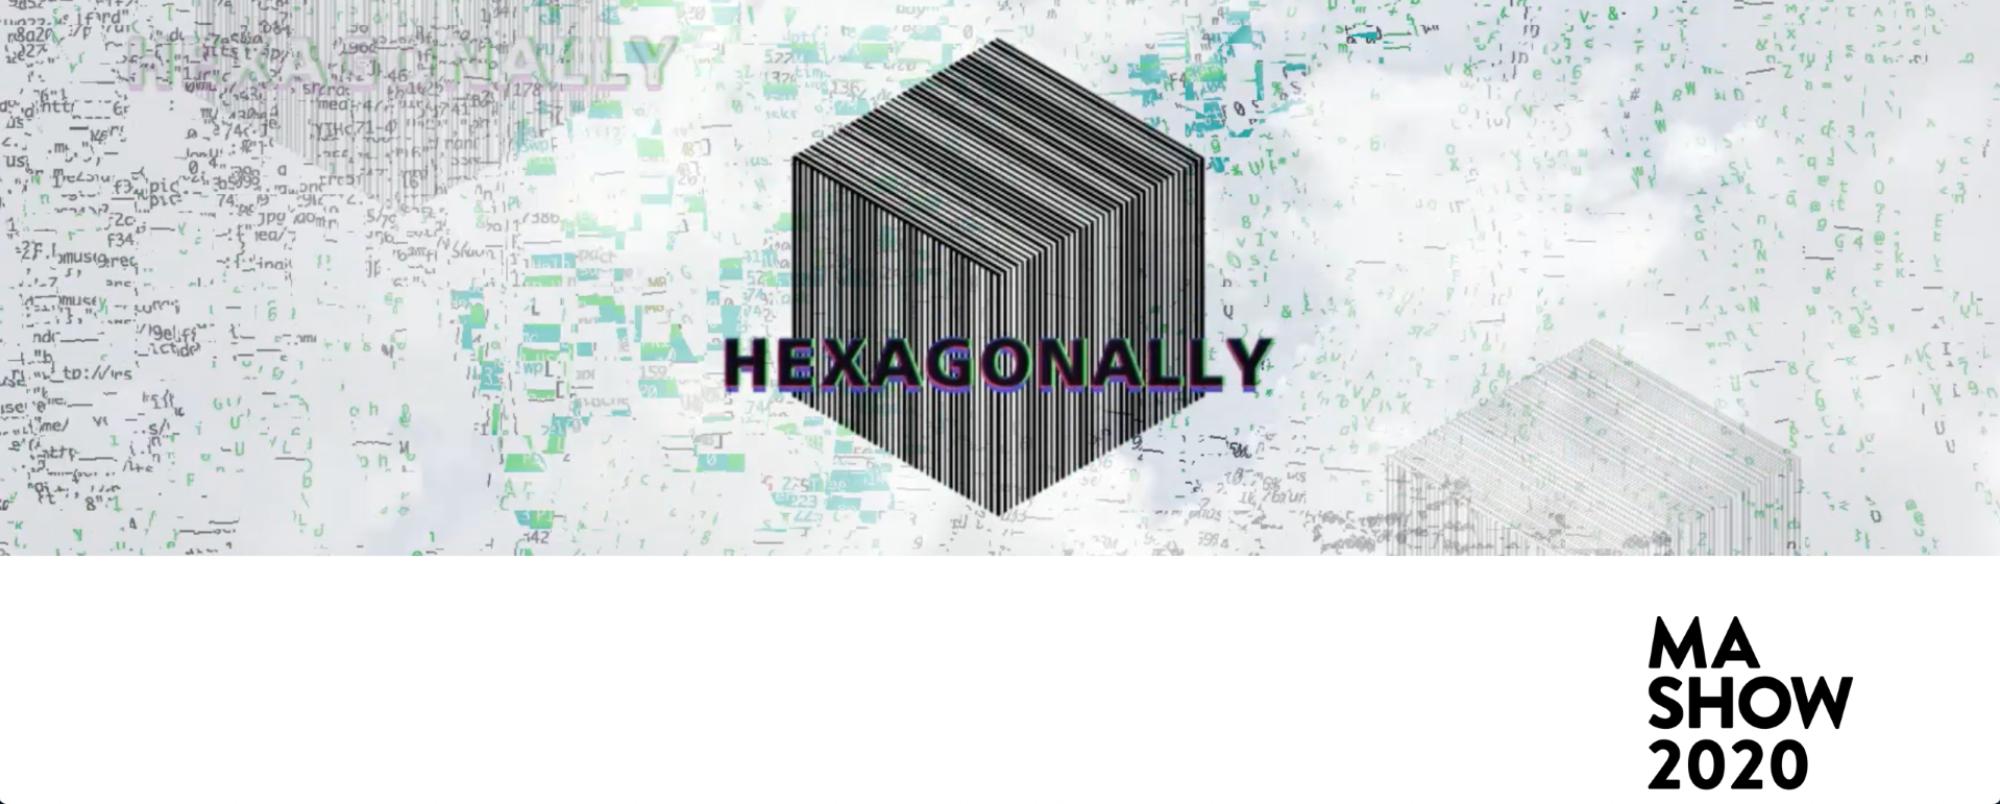 Hexagonally